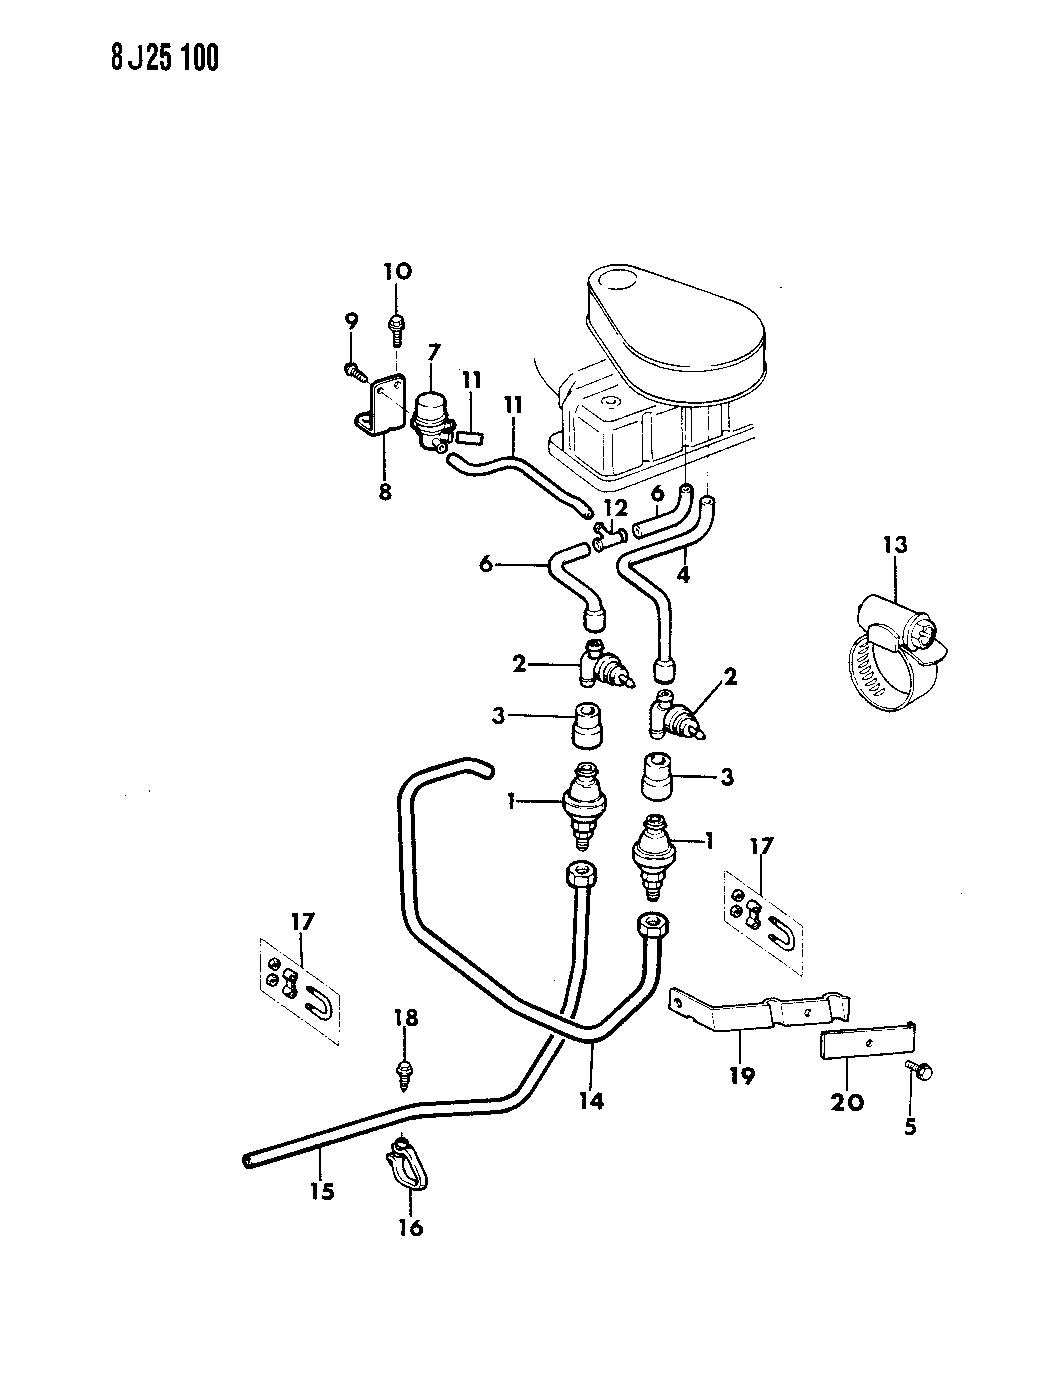 1988 jeep wrangler pulse air system